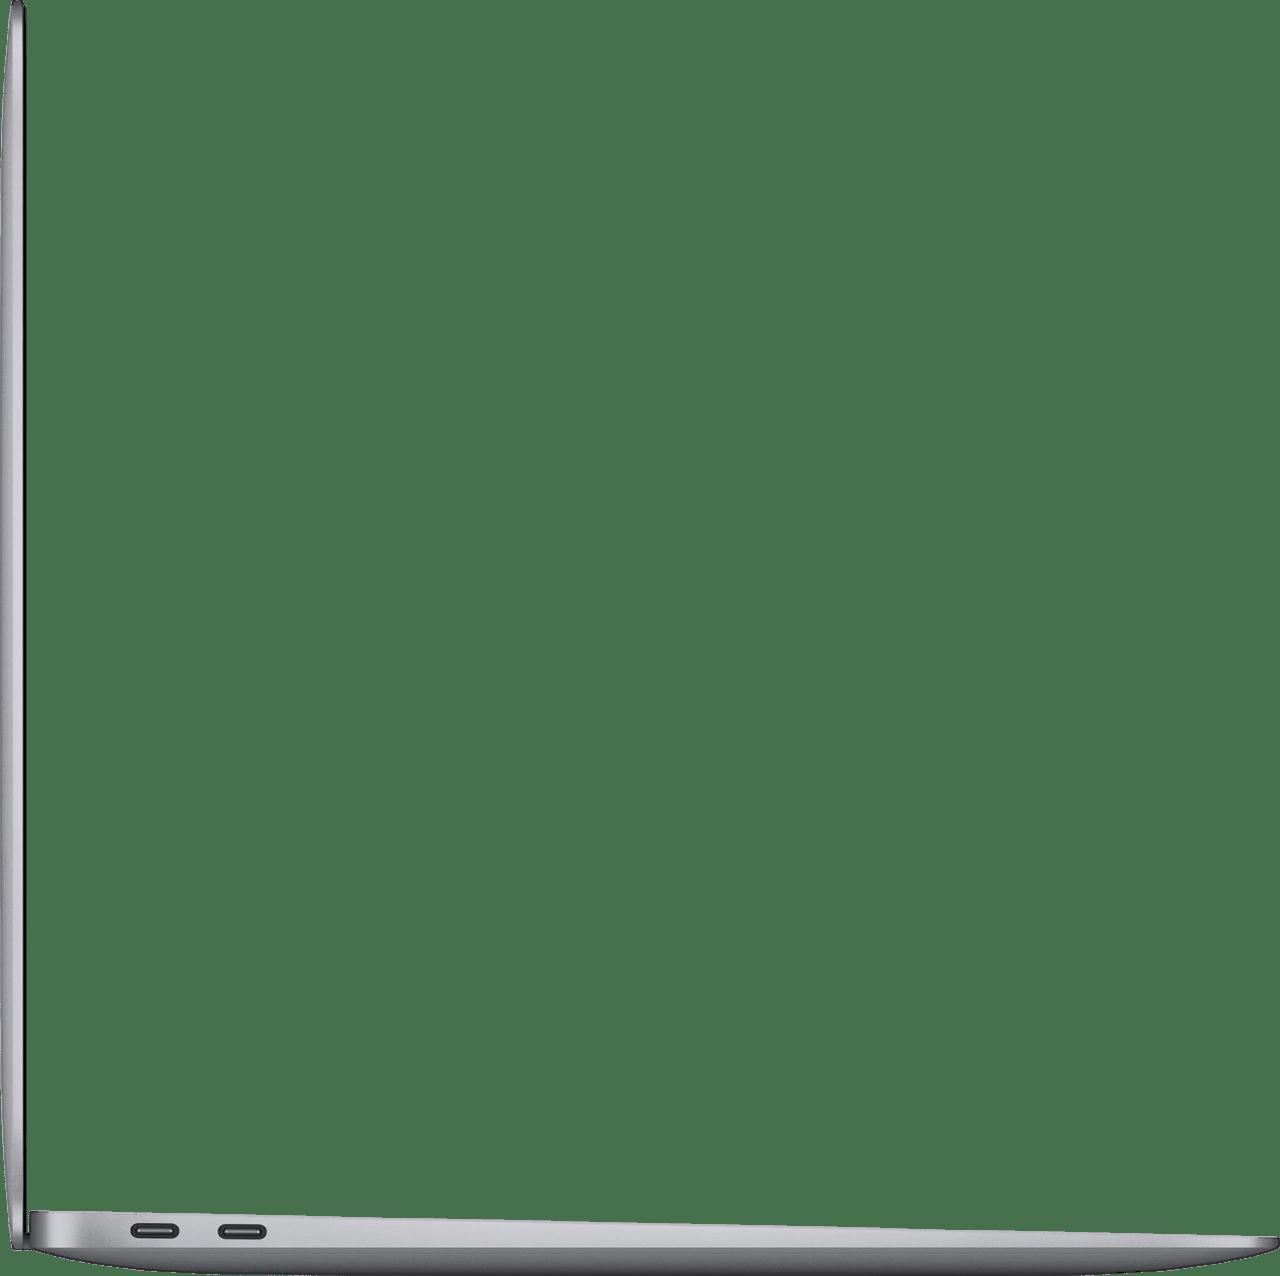 Space Grau Apple MacBook Air (Late 2020) - English (QWERTY) Notebook - Apple M1 - 16GB - 256GB SSD - Apple Integrated 7-core GPU.2